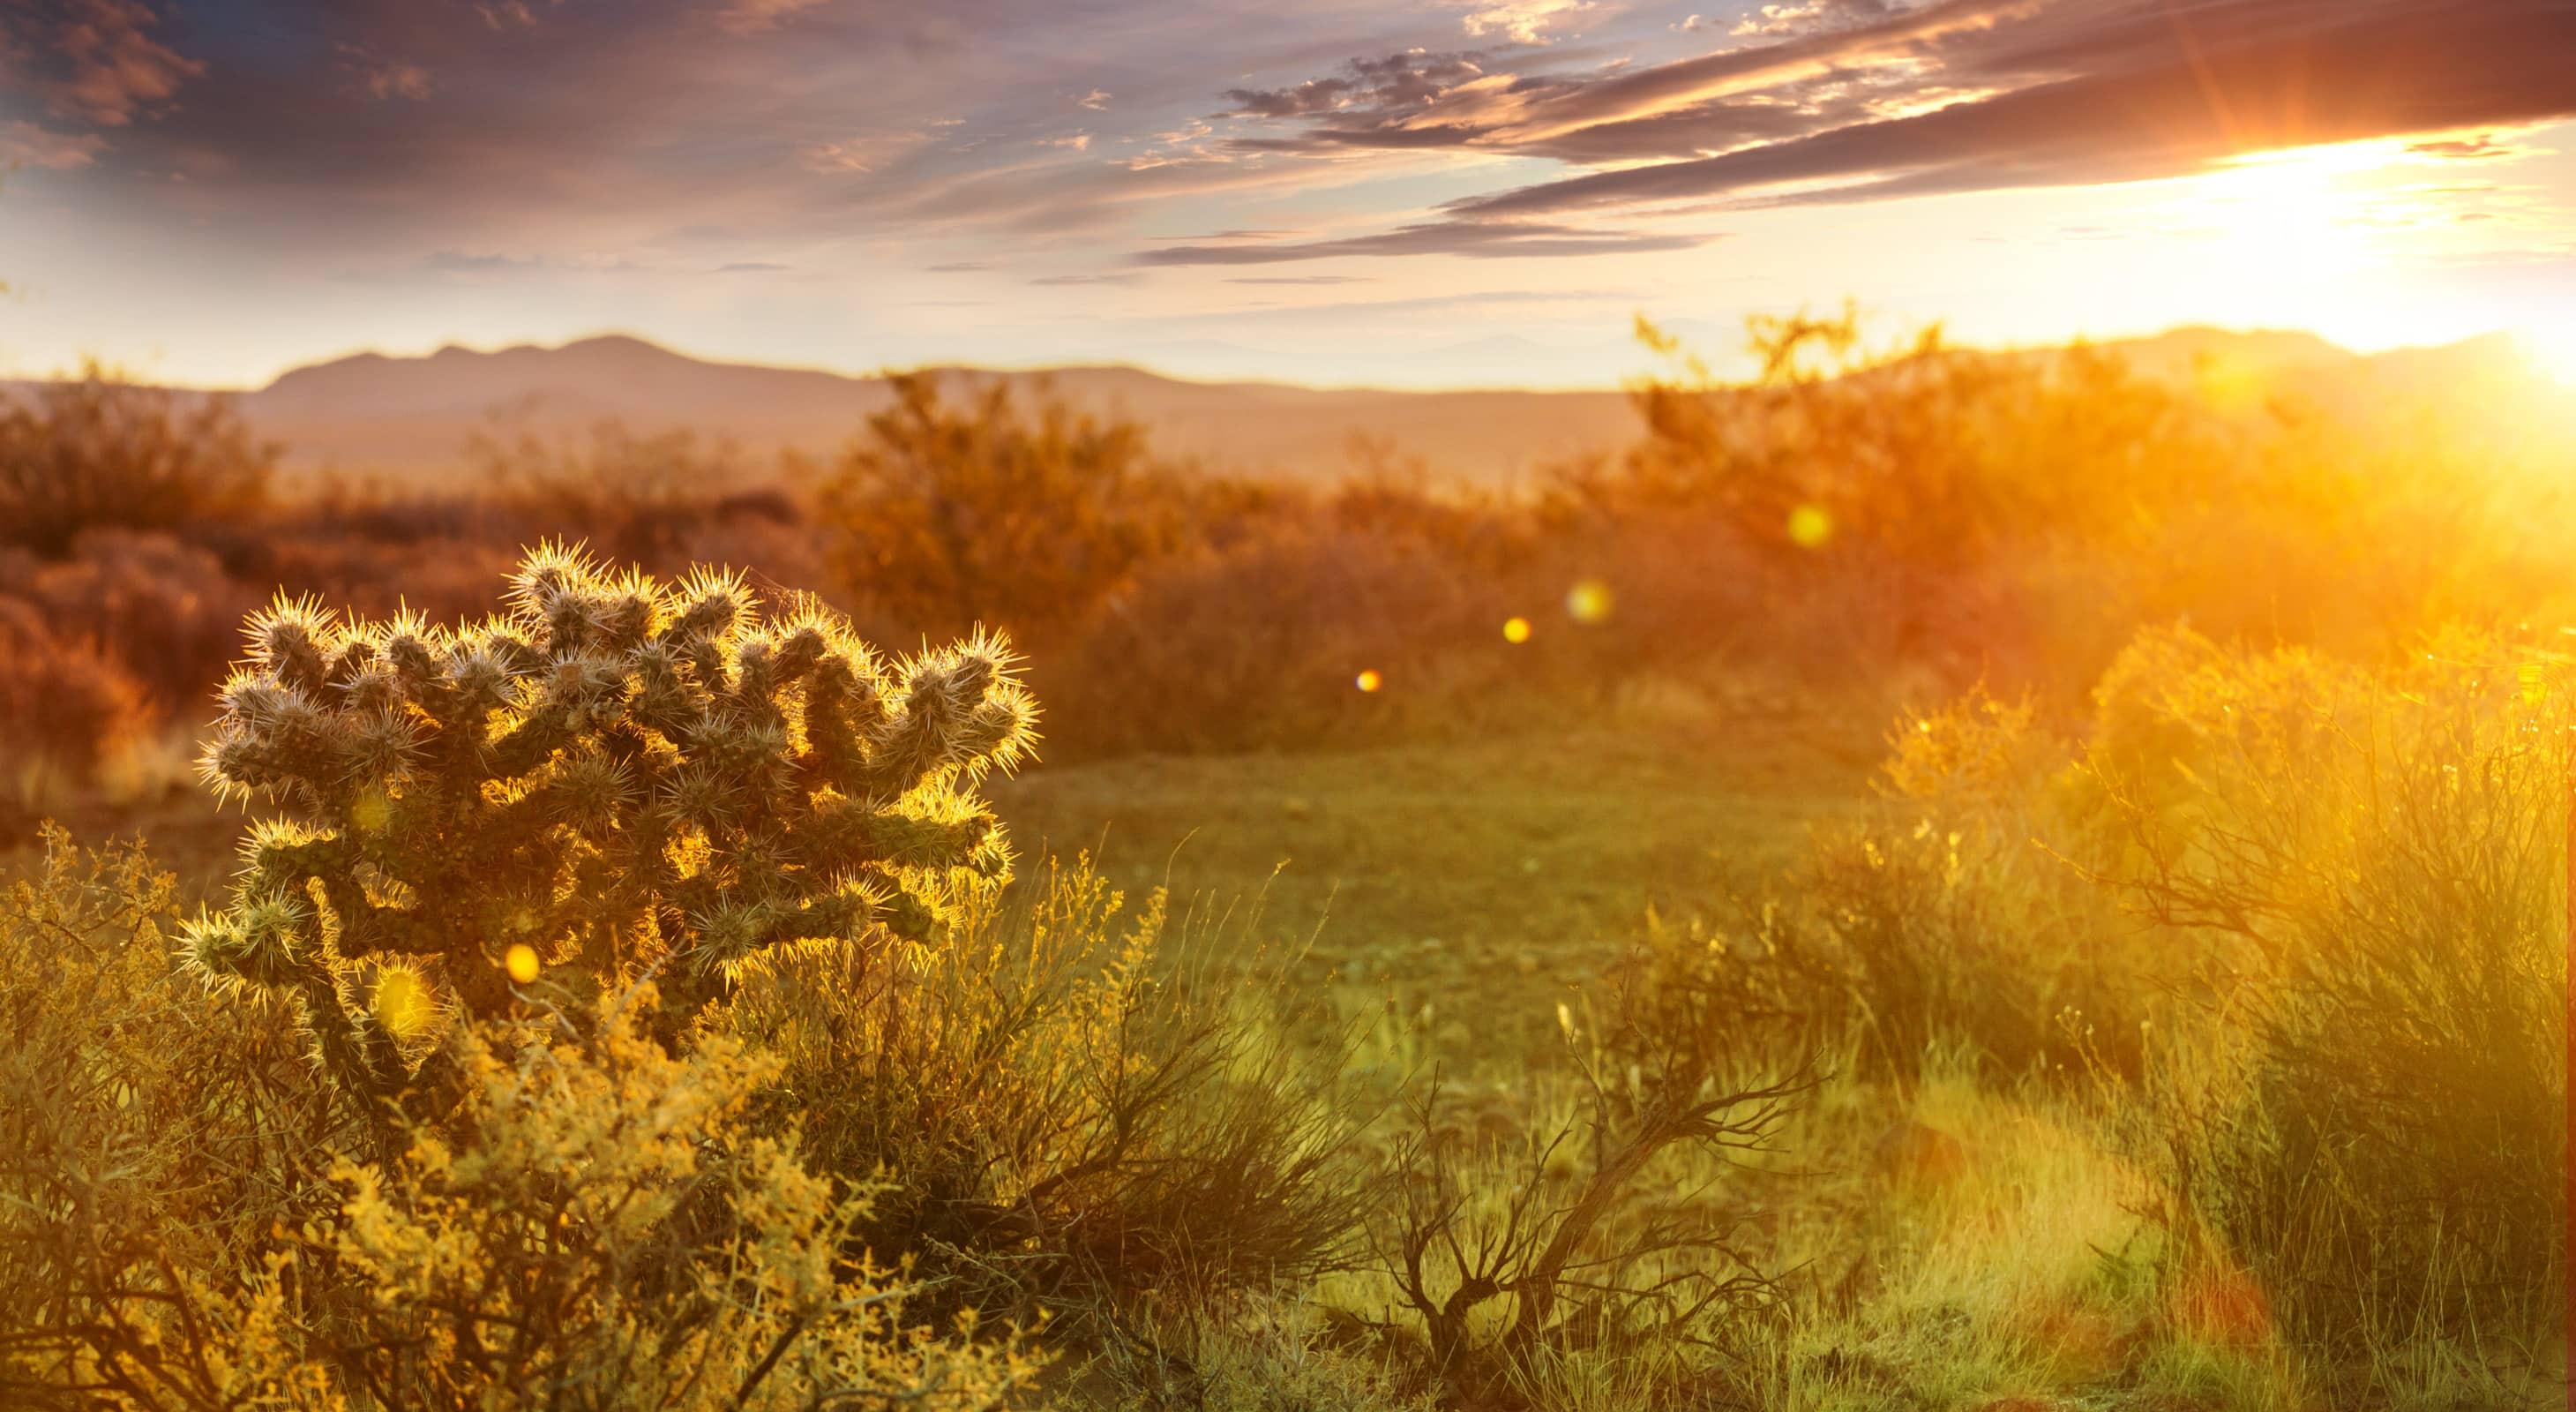 Cactus Sunset - Tucson Arizona activities